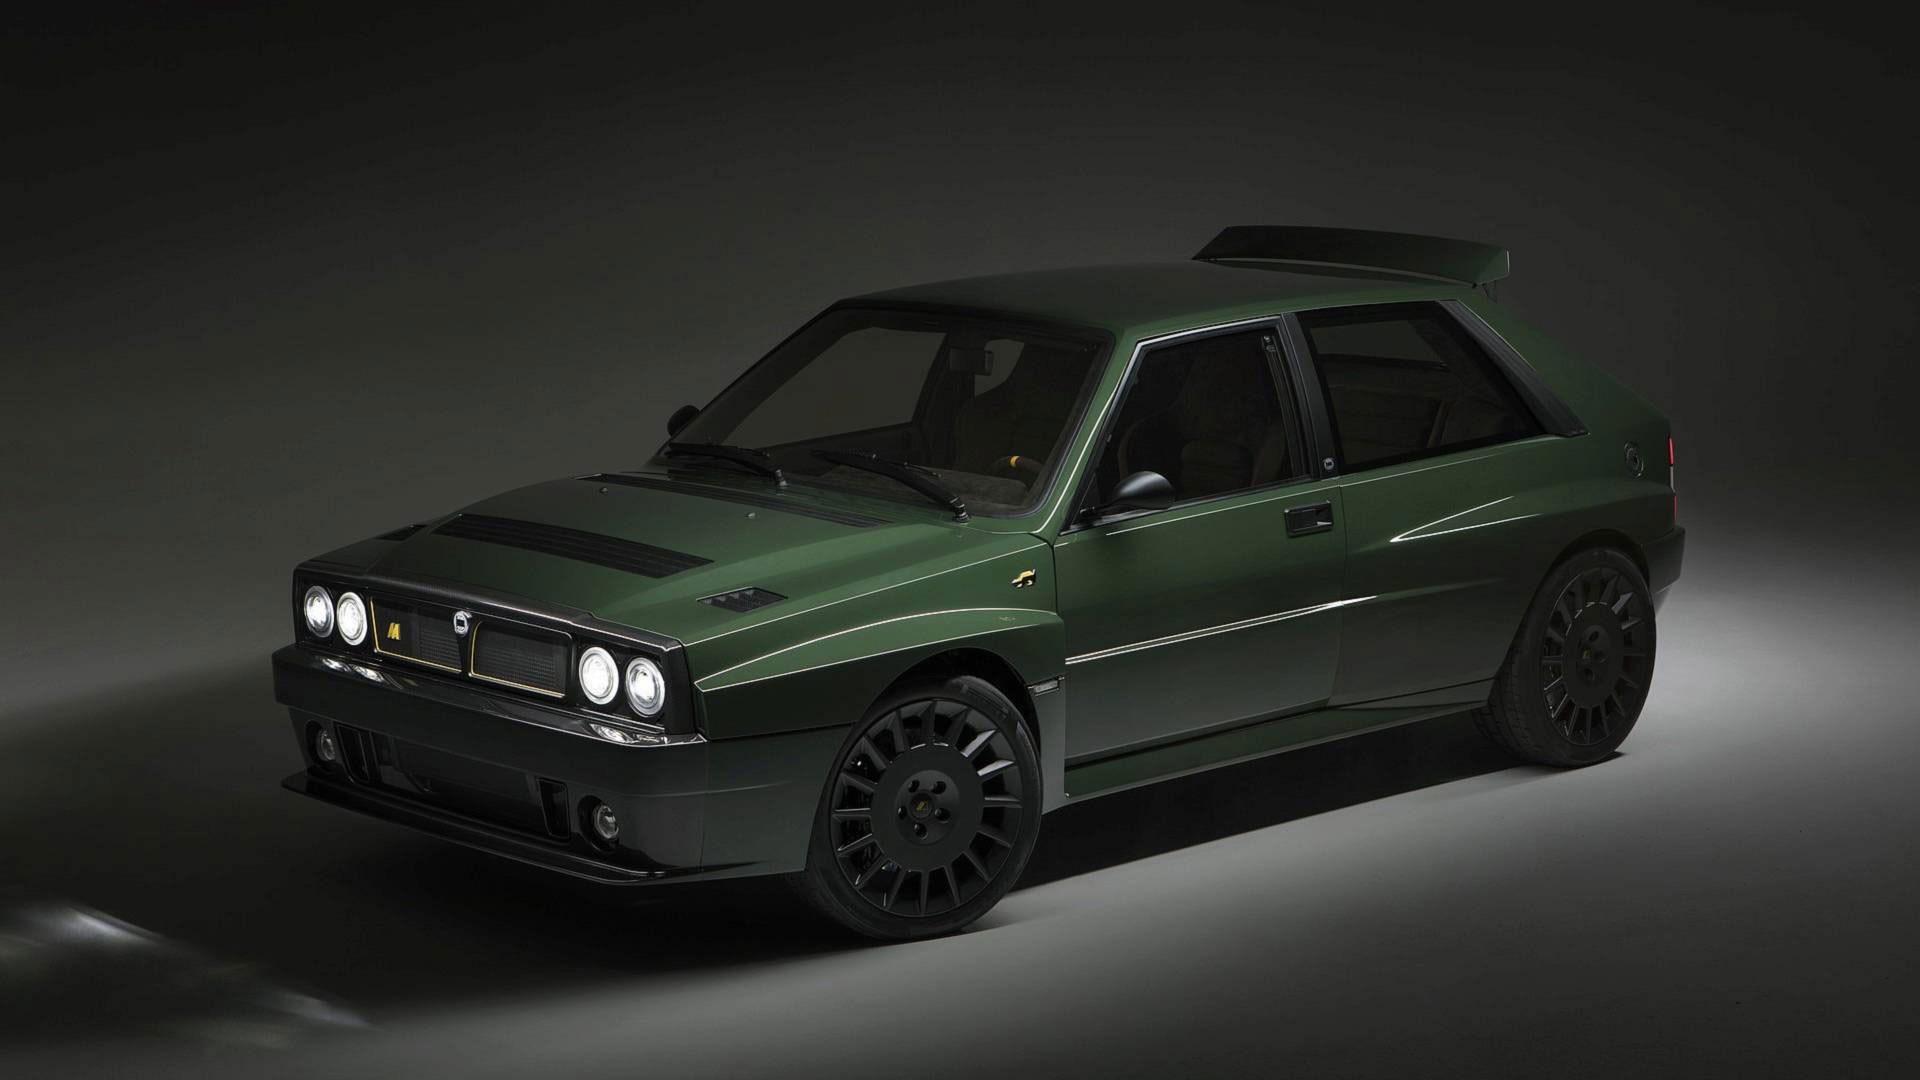 Lancia Delta Integrale Futurista Restomod Revealed At